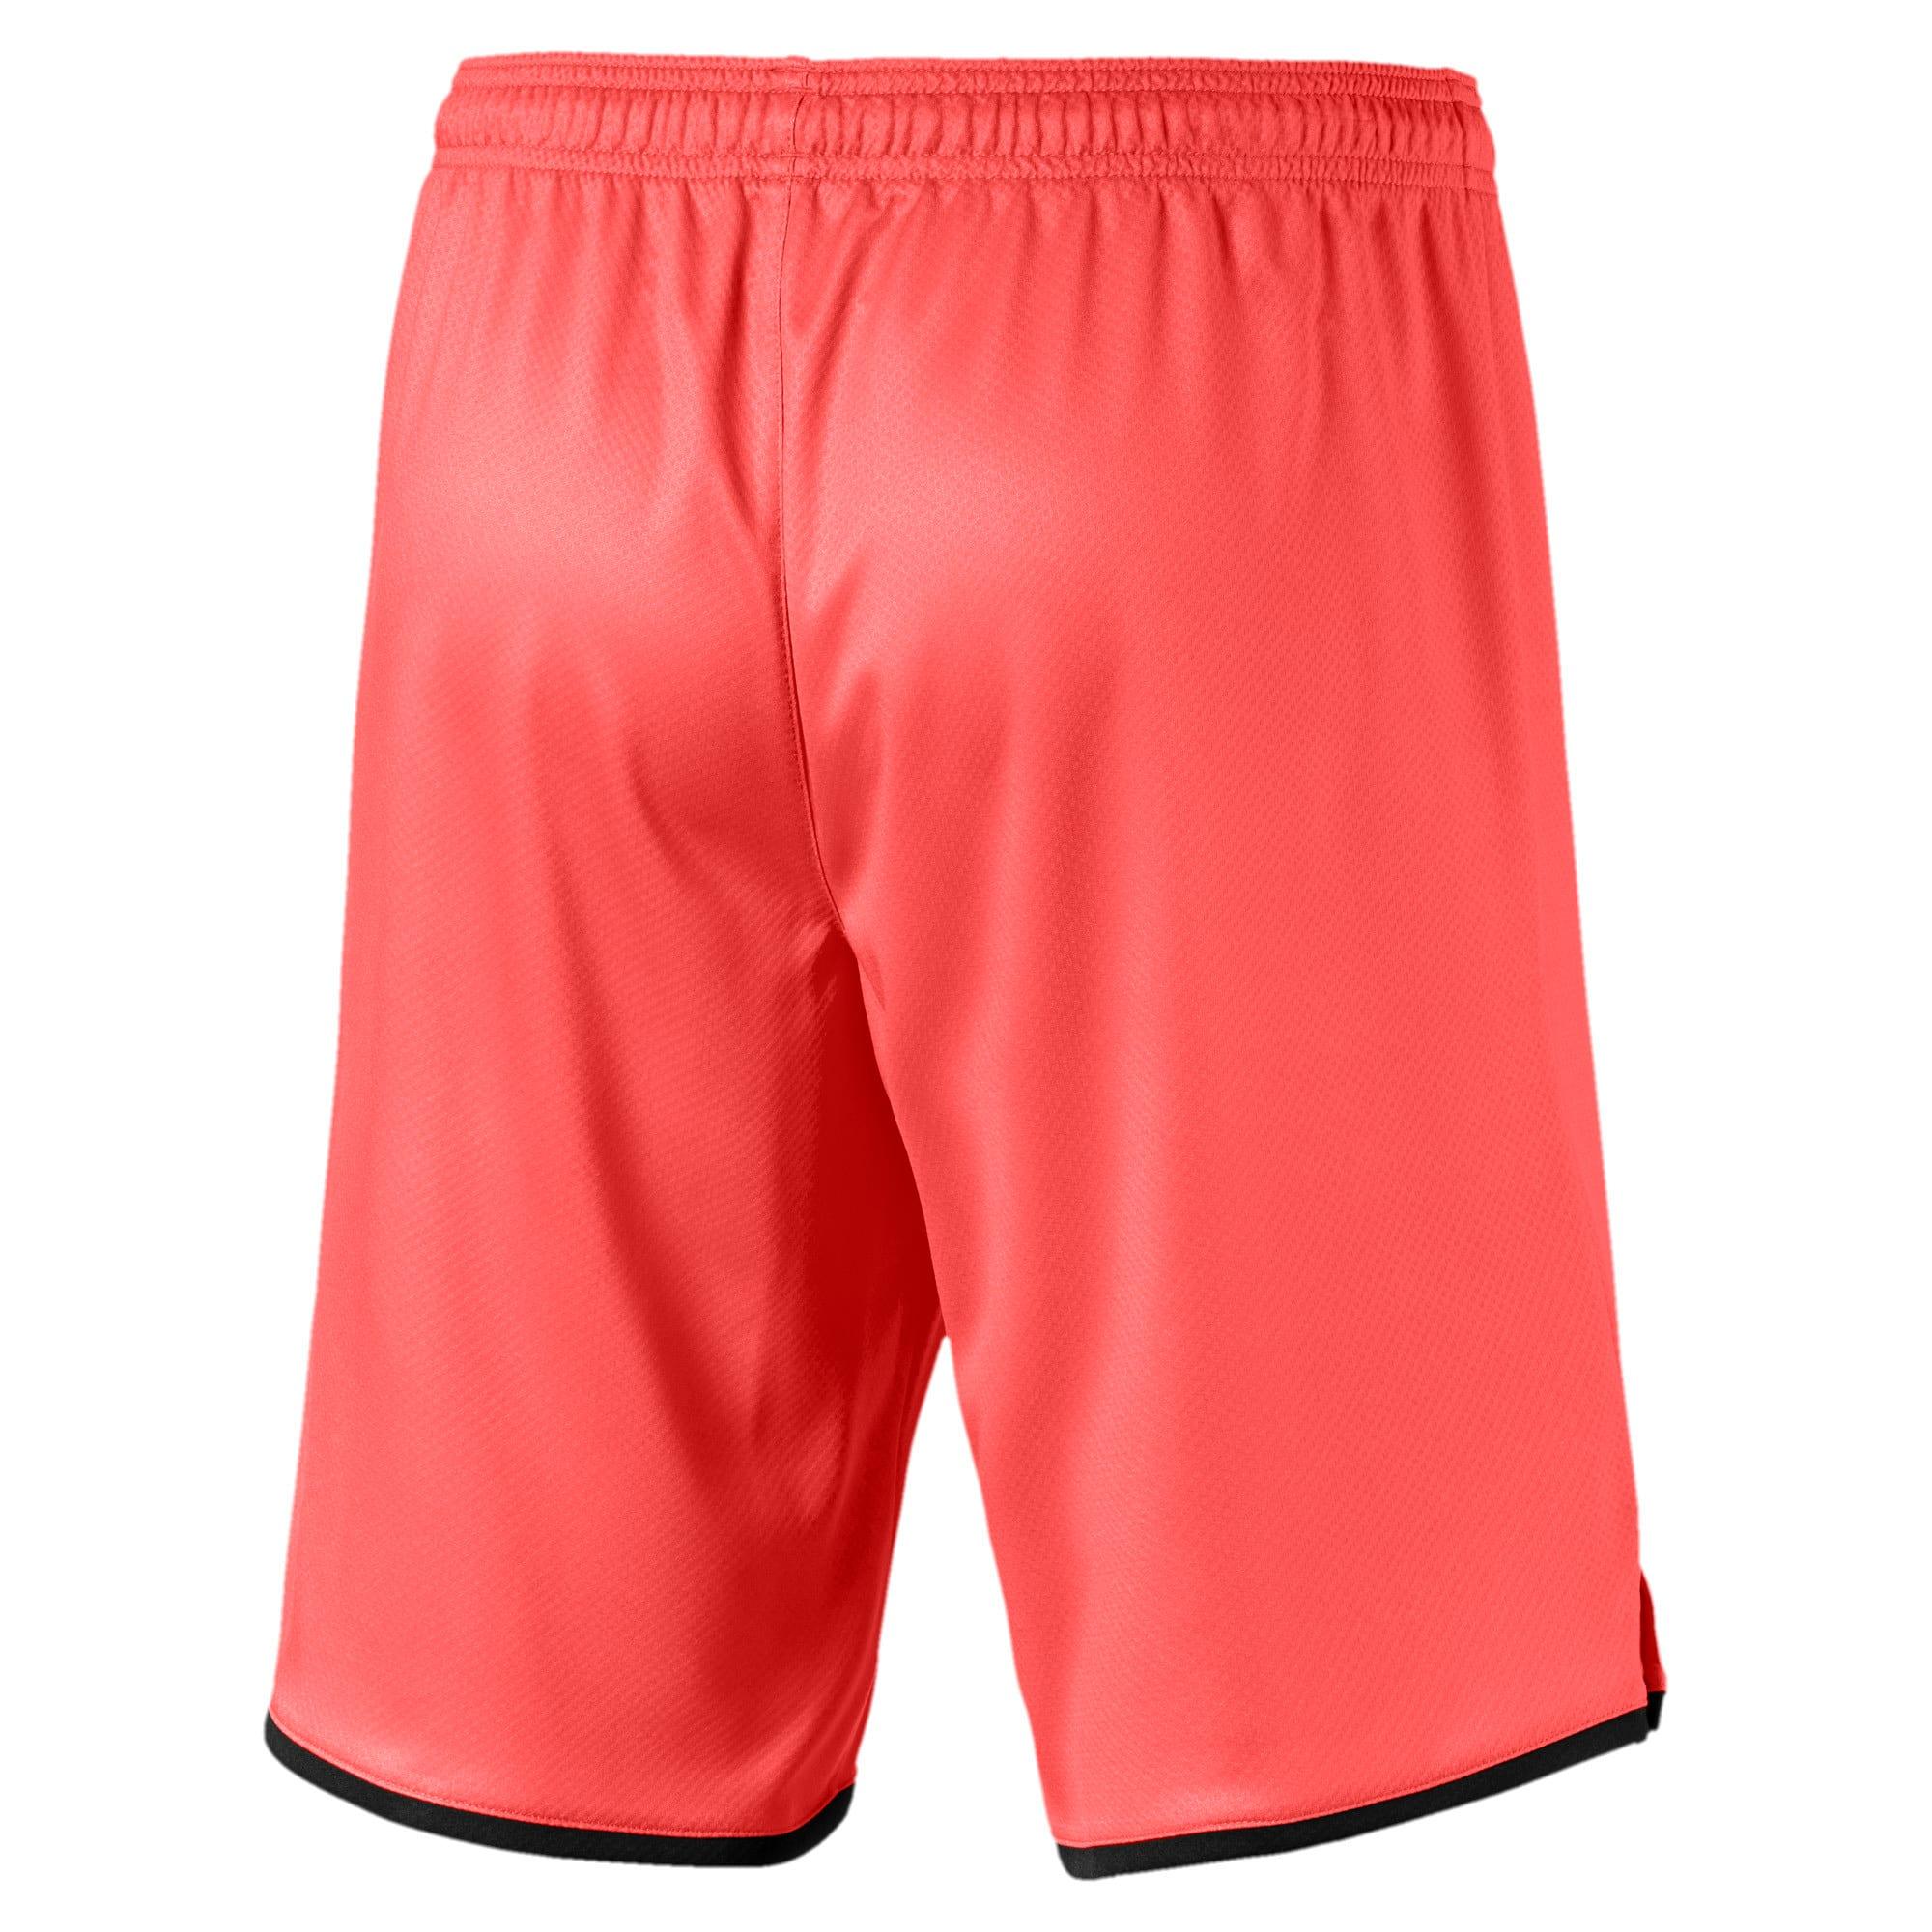 Thumbnail 2 of Manchester City Men's Third Replica Shorts, Georgia Peach-Puma Black, medium